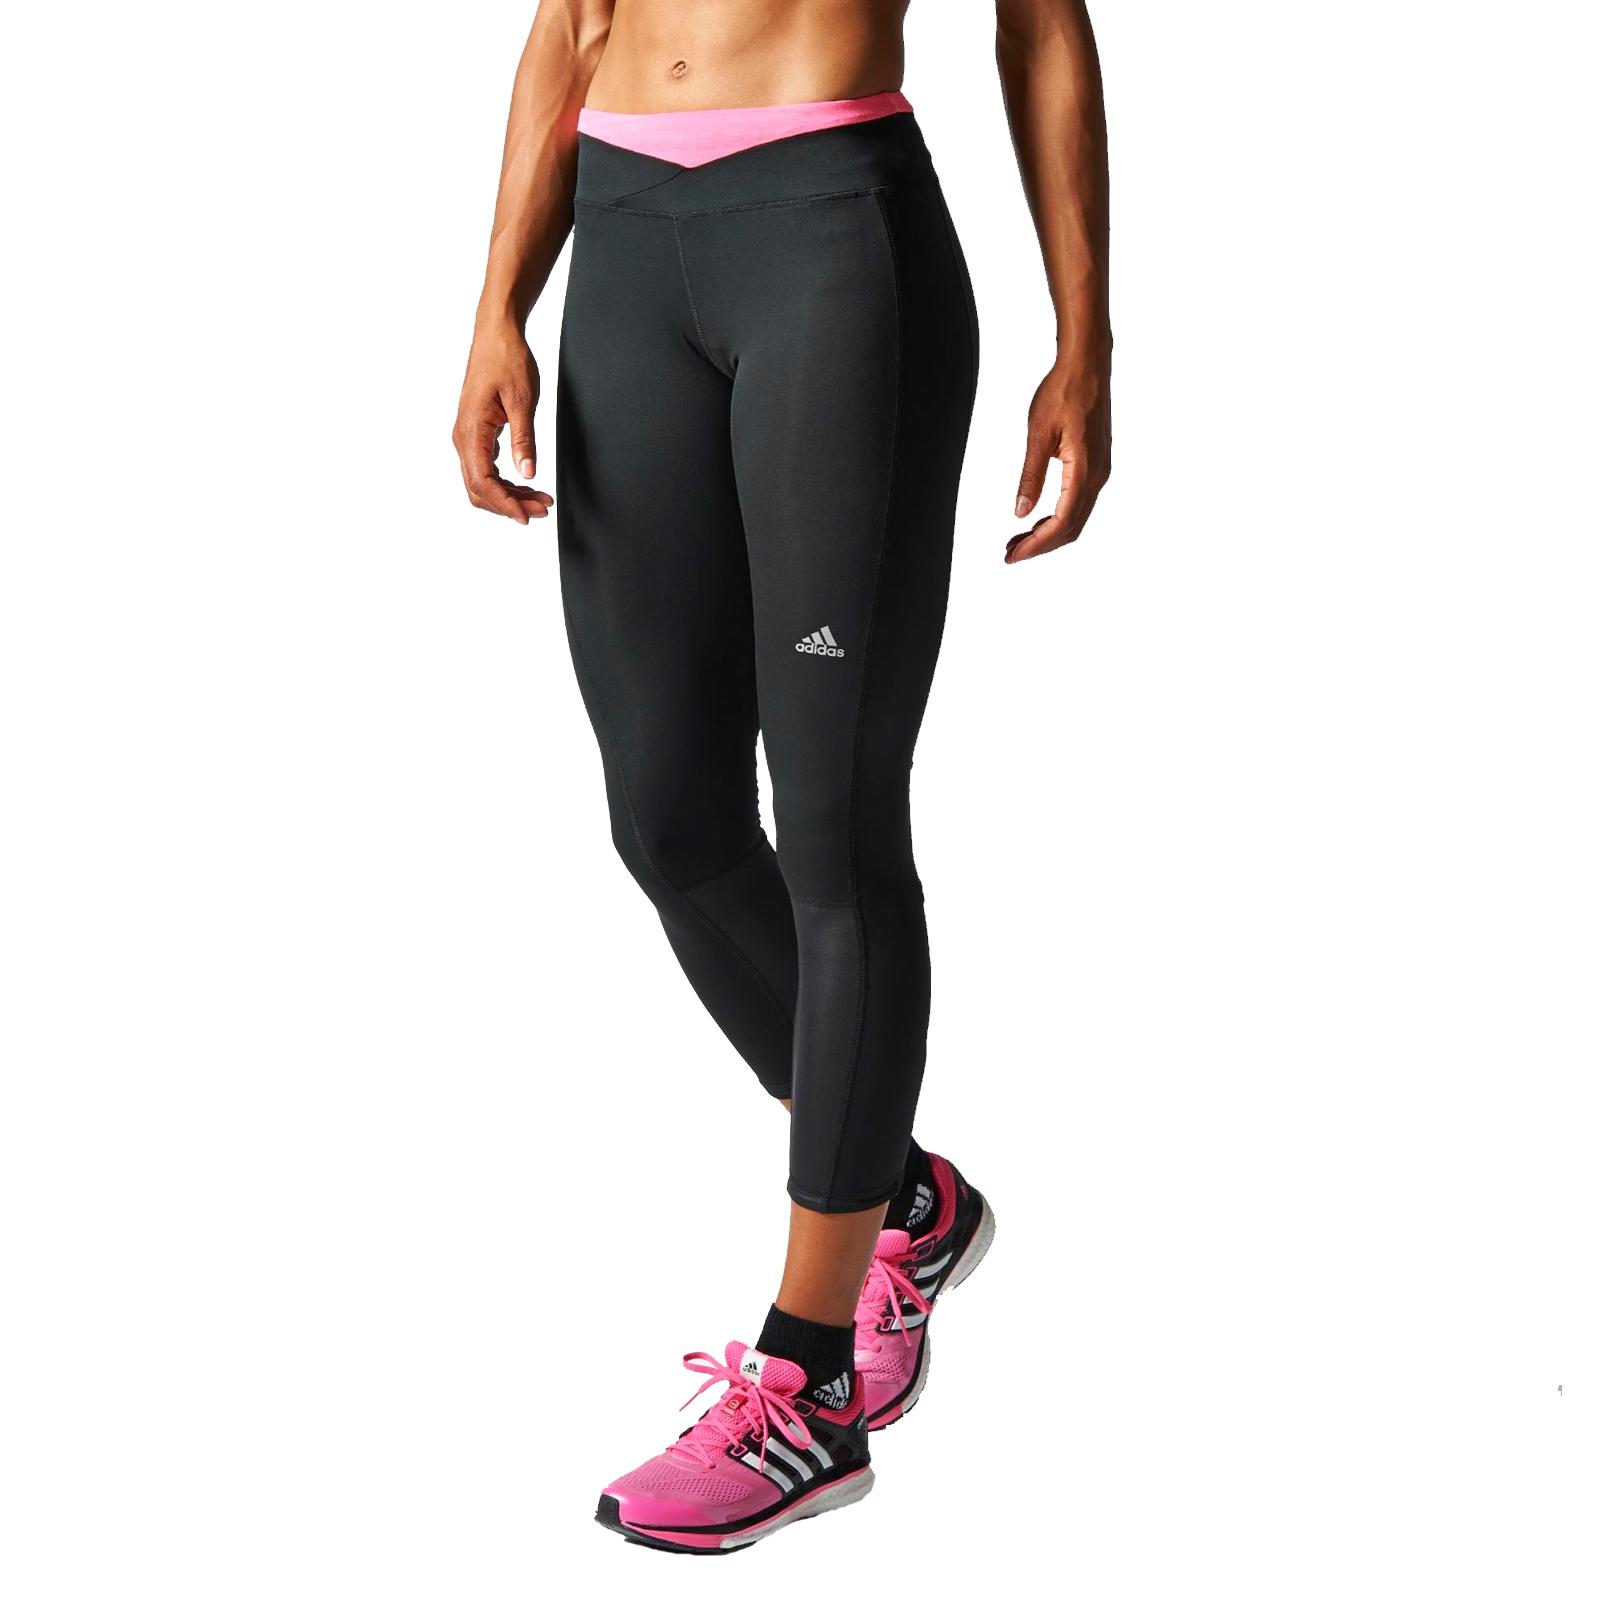 adidas performance womens supernova long running gym training leggings black ebay. Black Bedroom Furniture Sets. Home Design Ideas